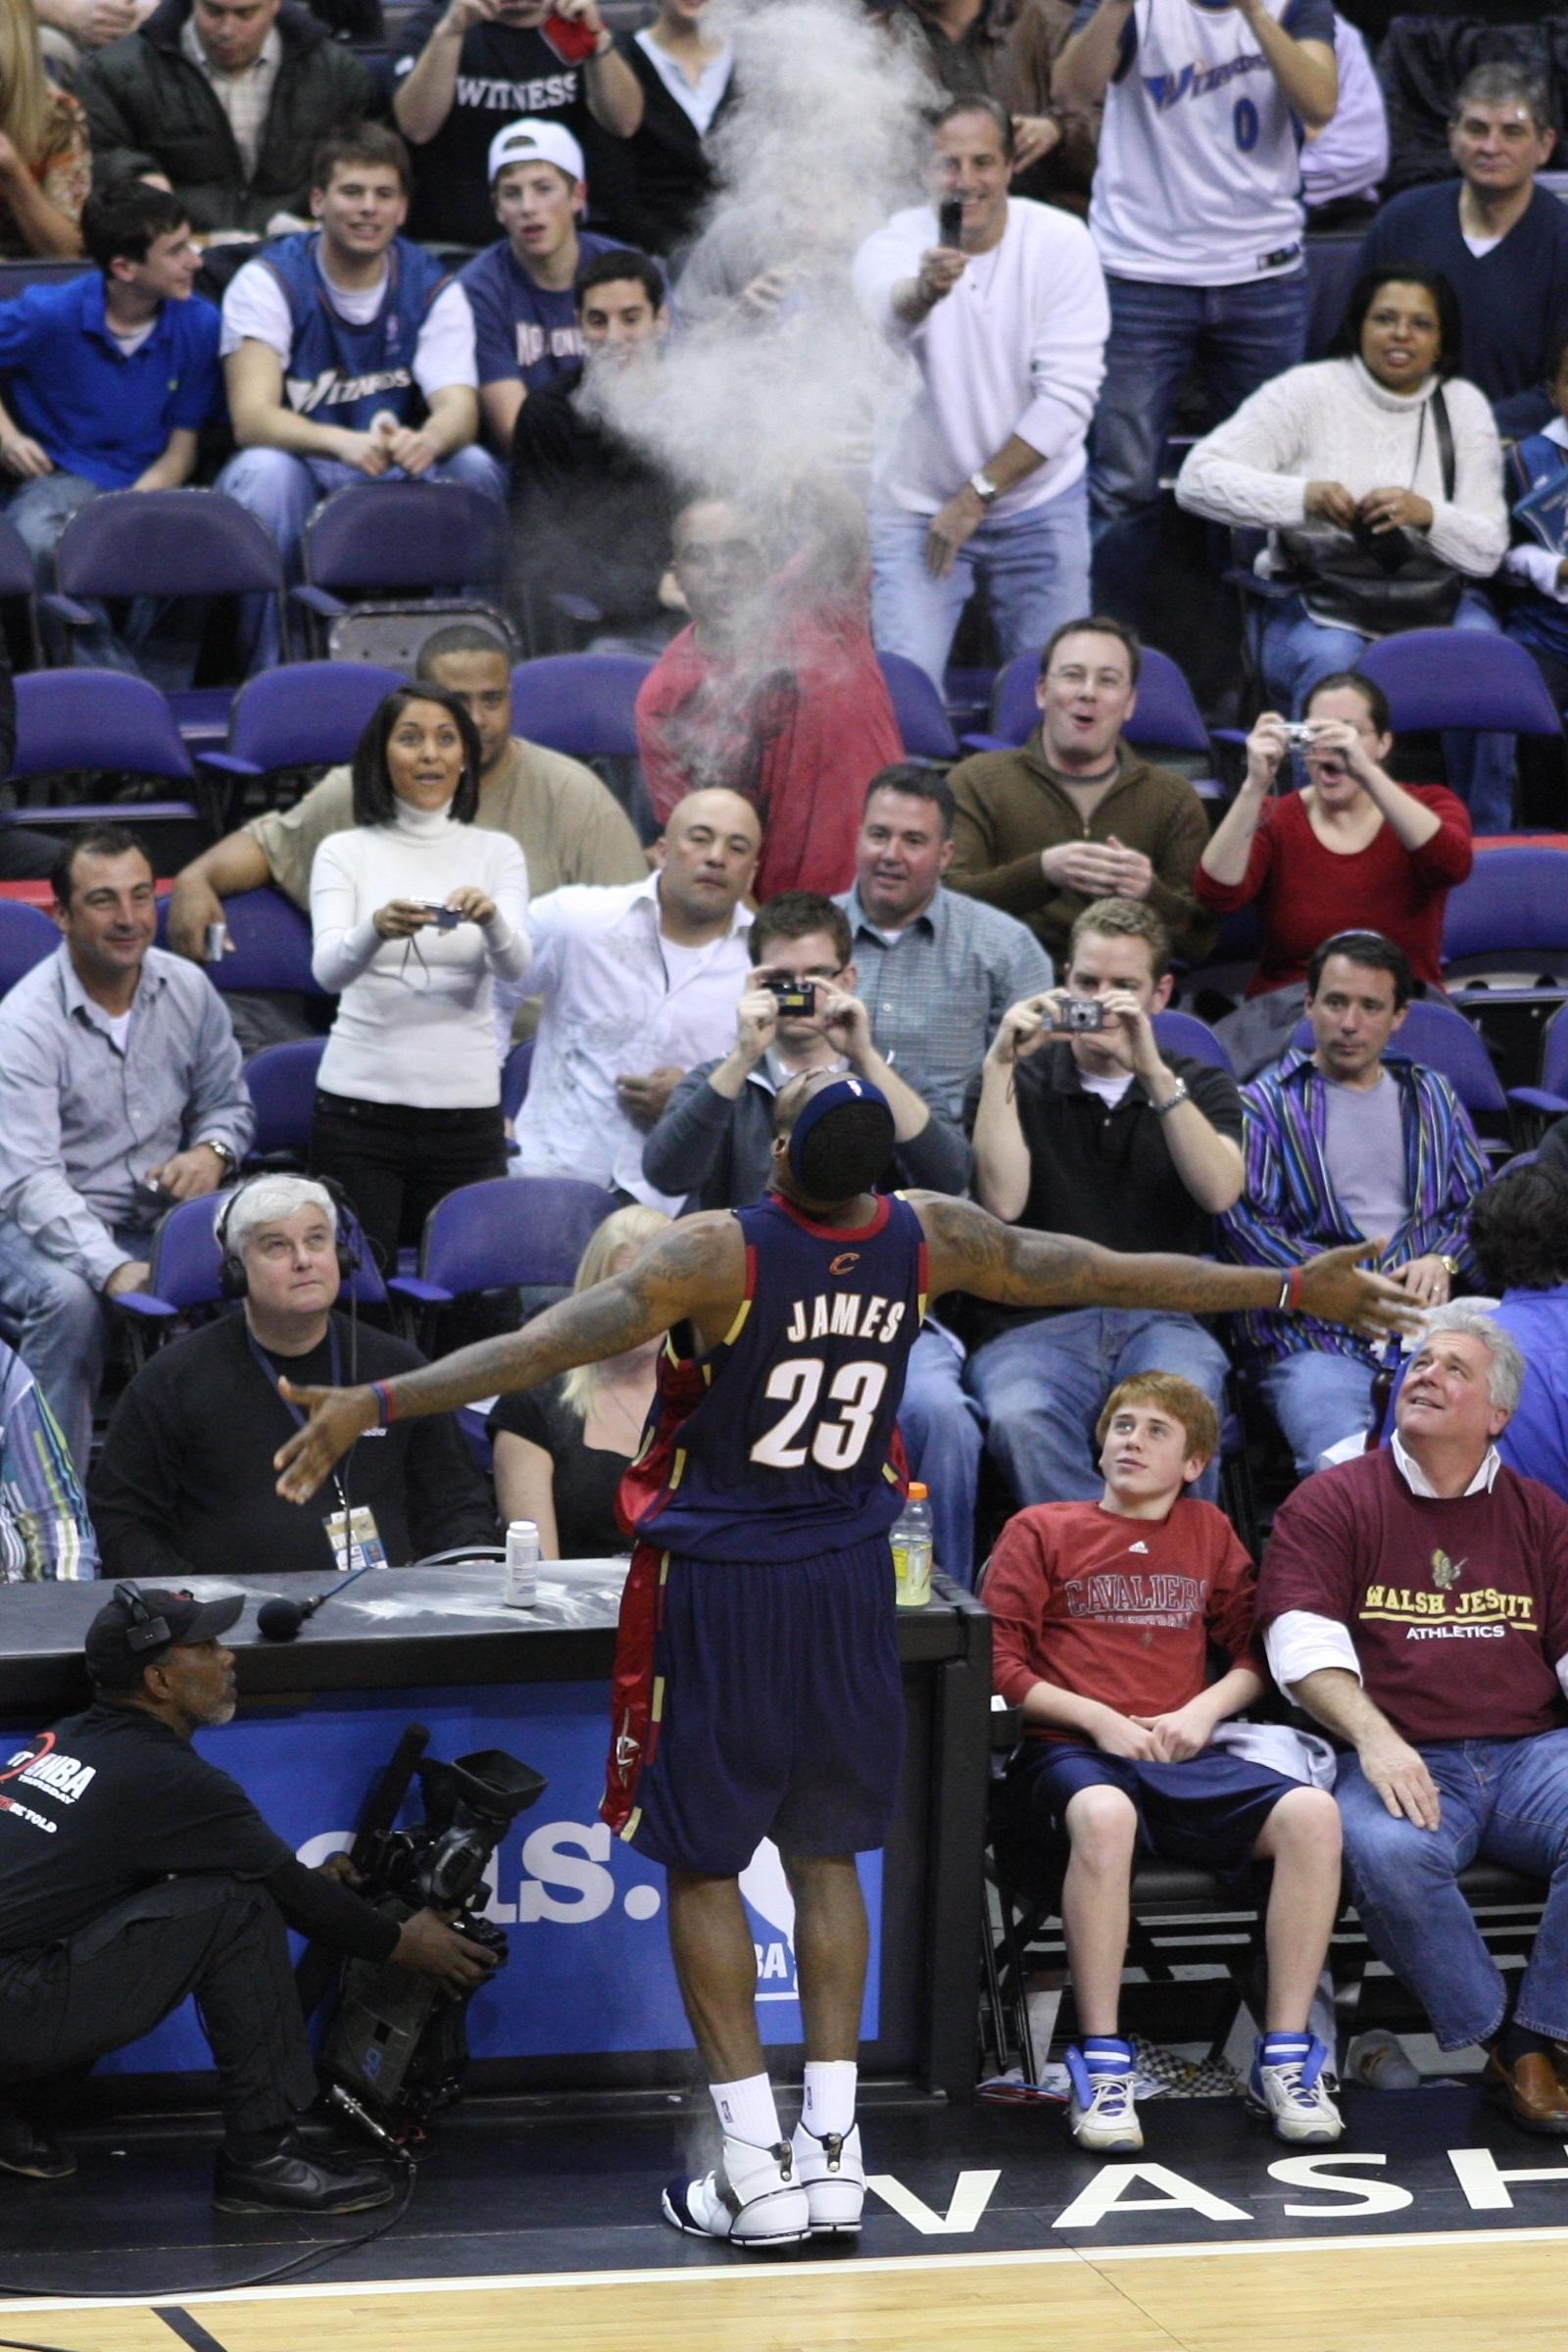 File:LeBron James' pregame ritual.jpg - Wikimedia Commons